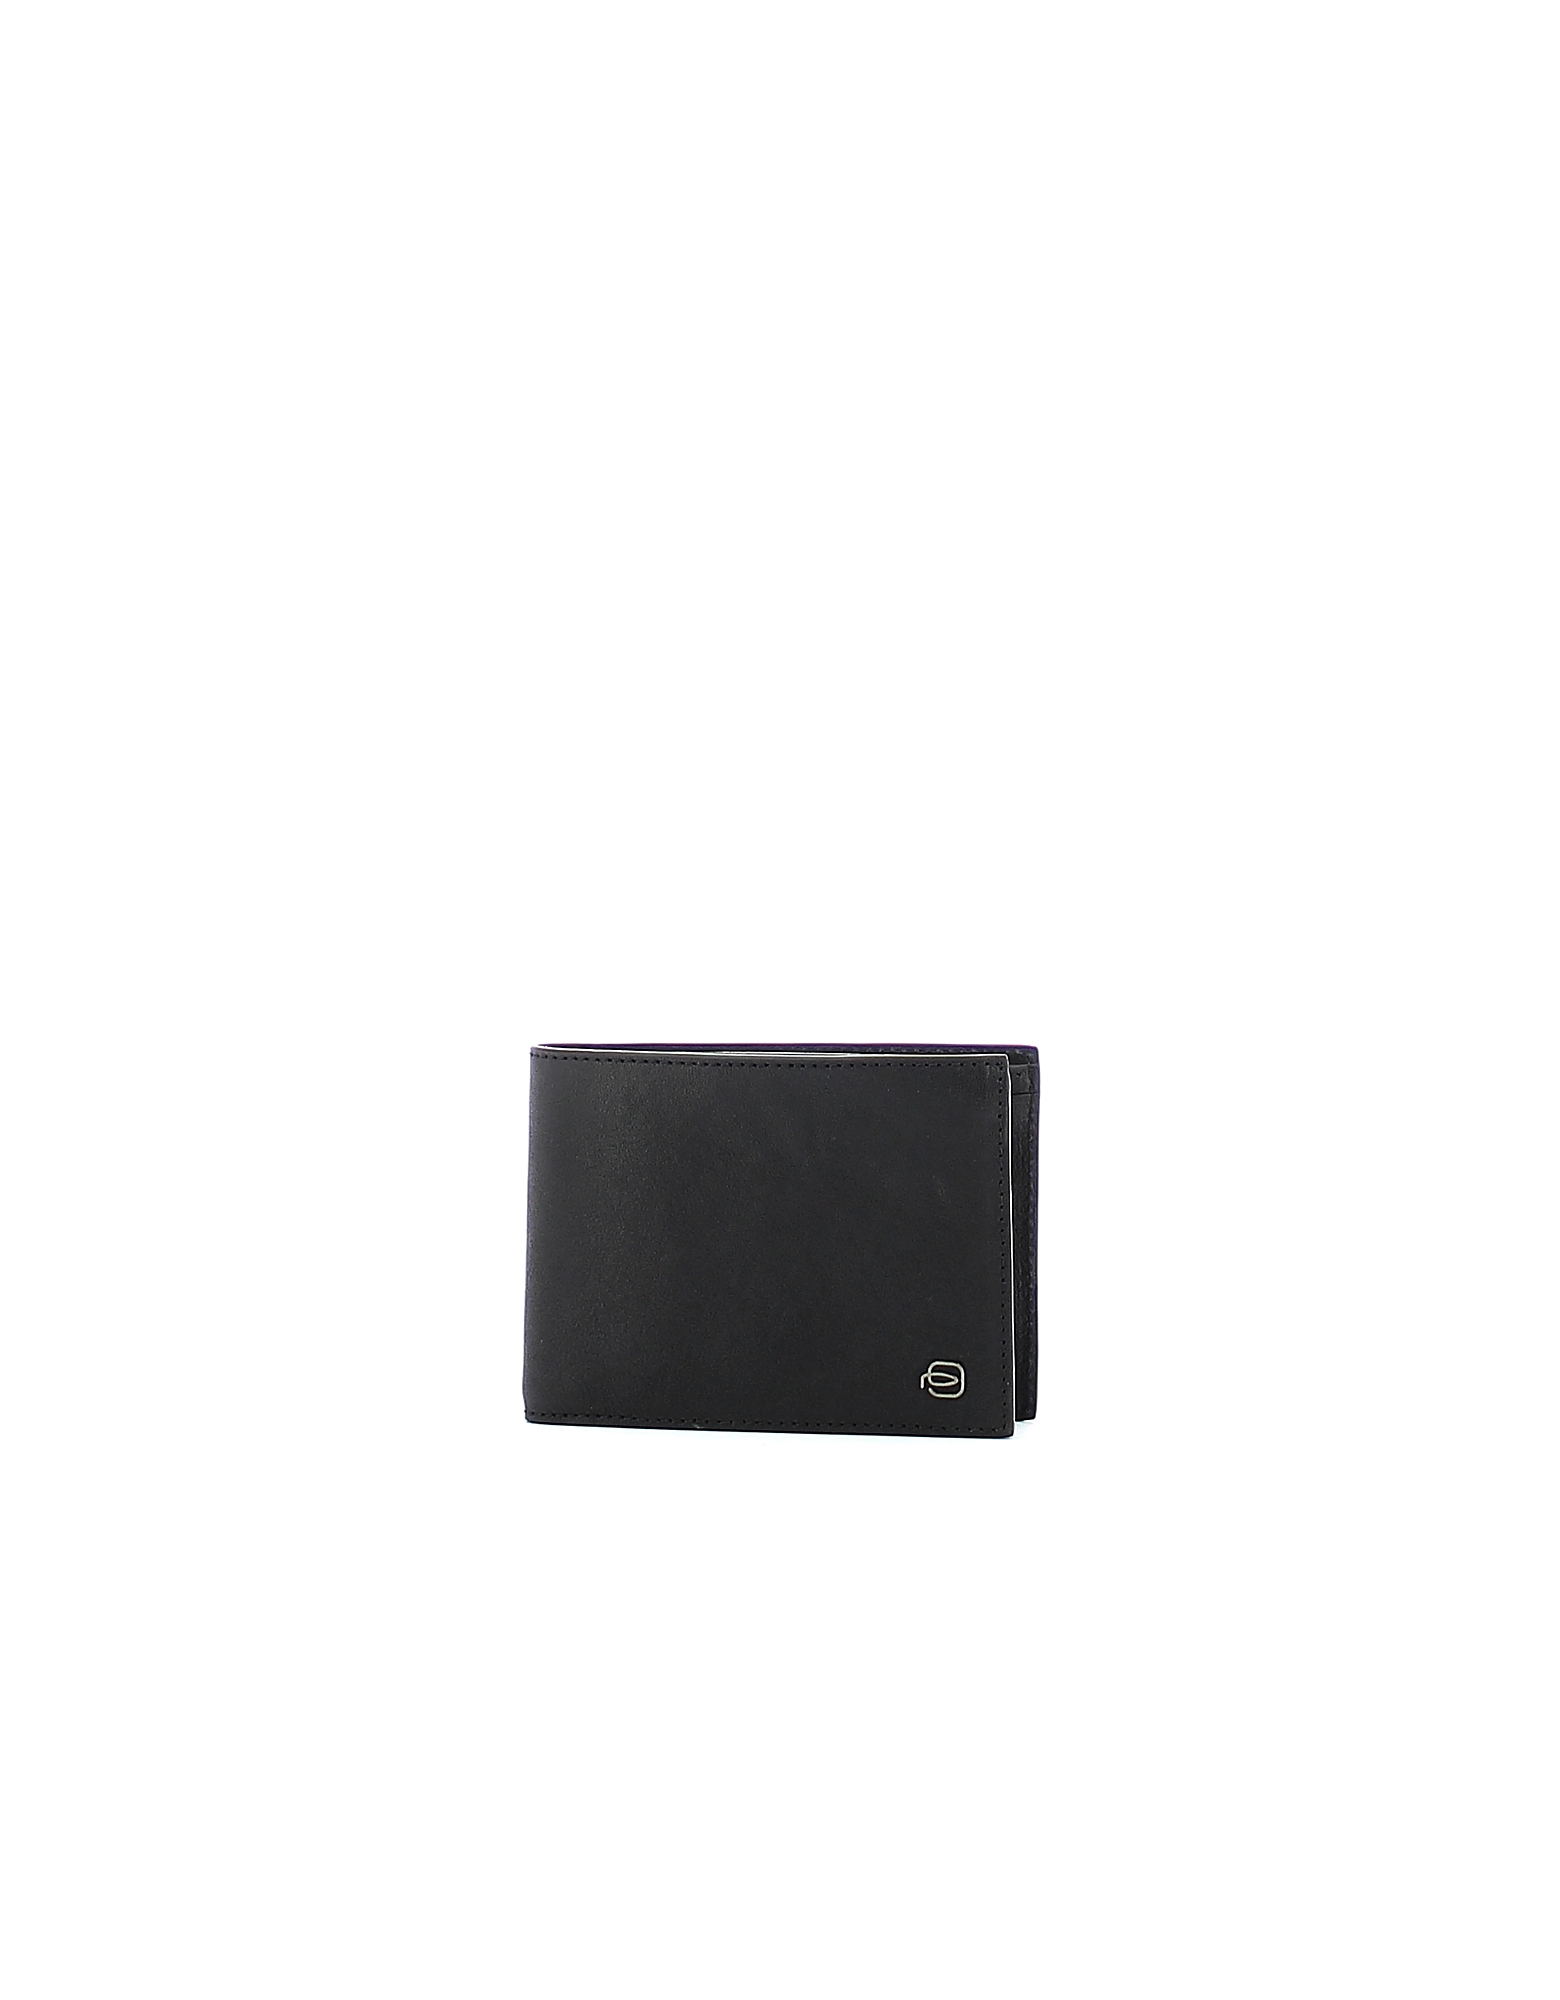 Piquadro Designer Men's Bags, Men's Black Wallet